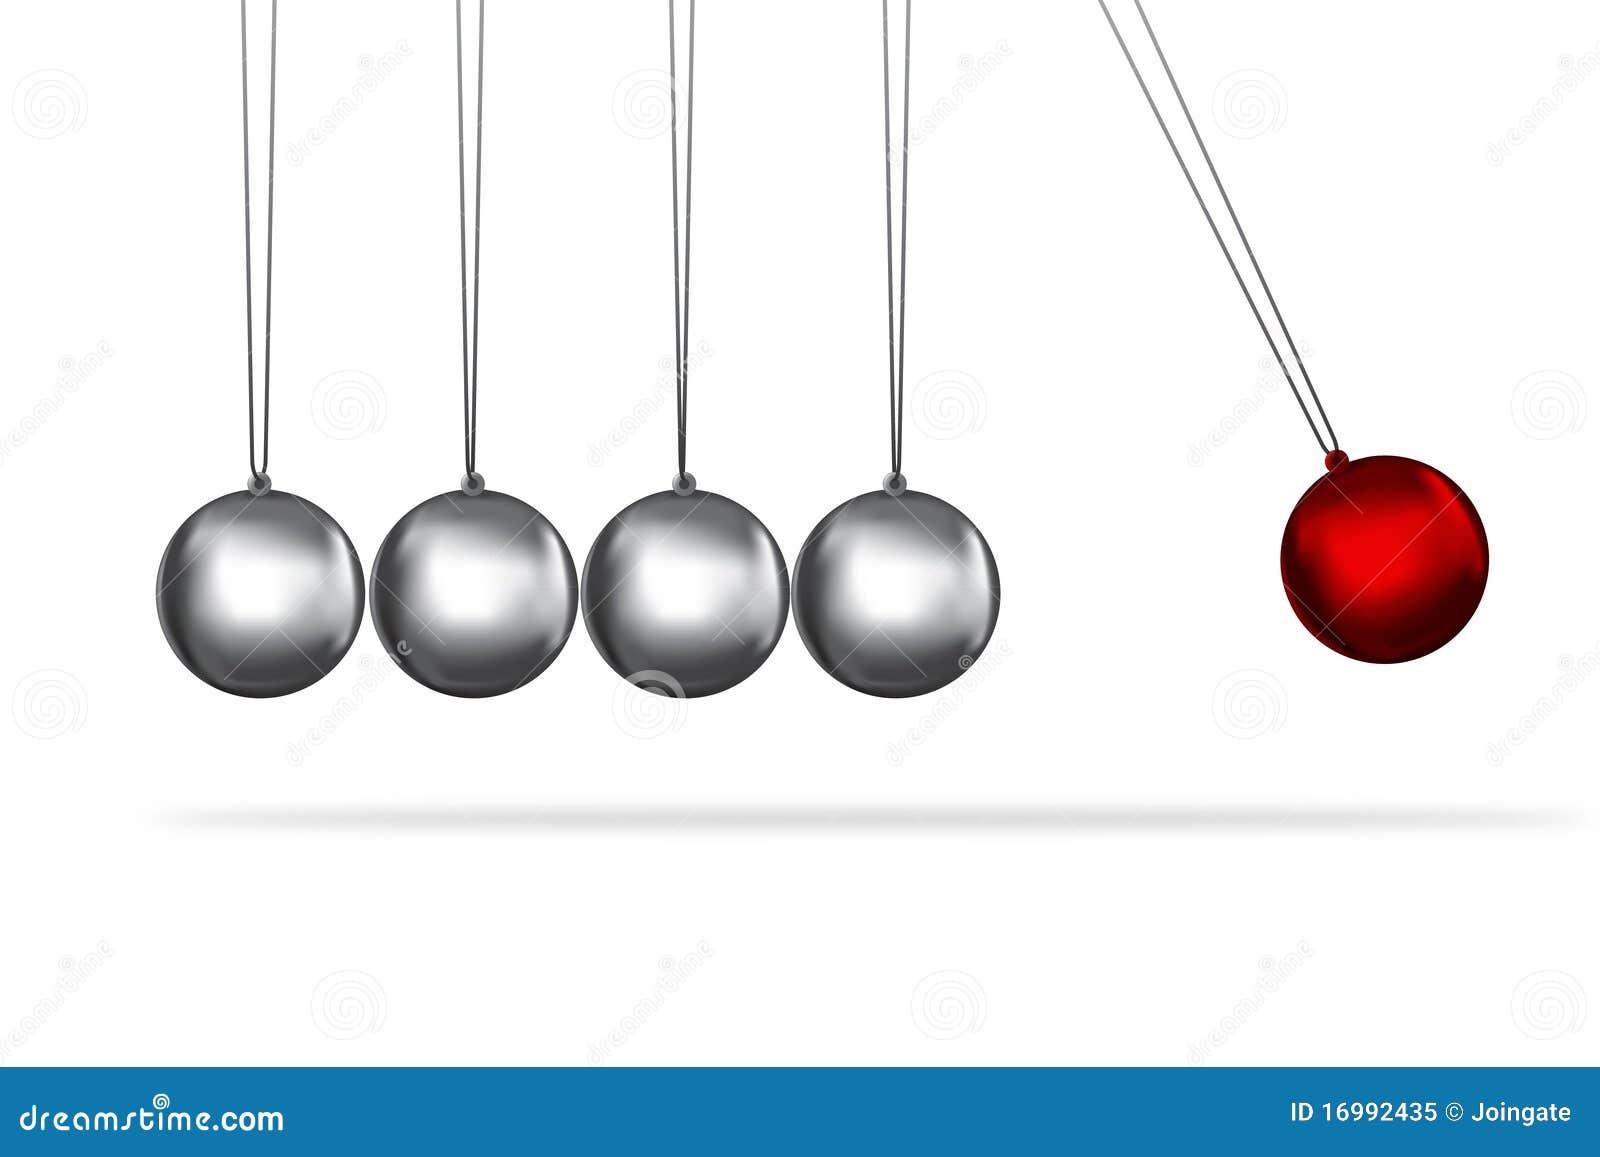 newtons cradle silver balls concept stock illustration